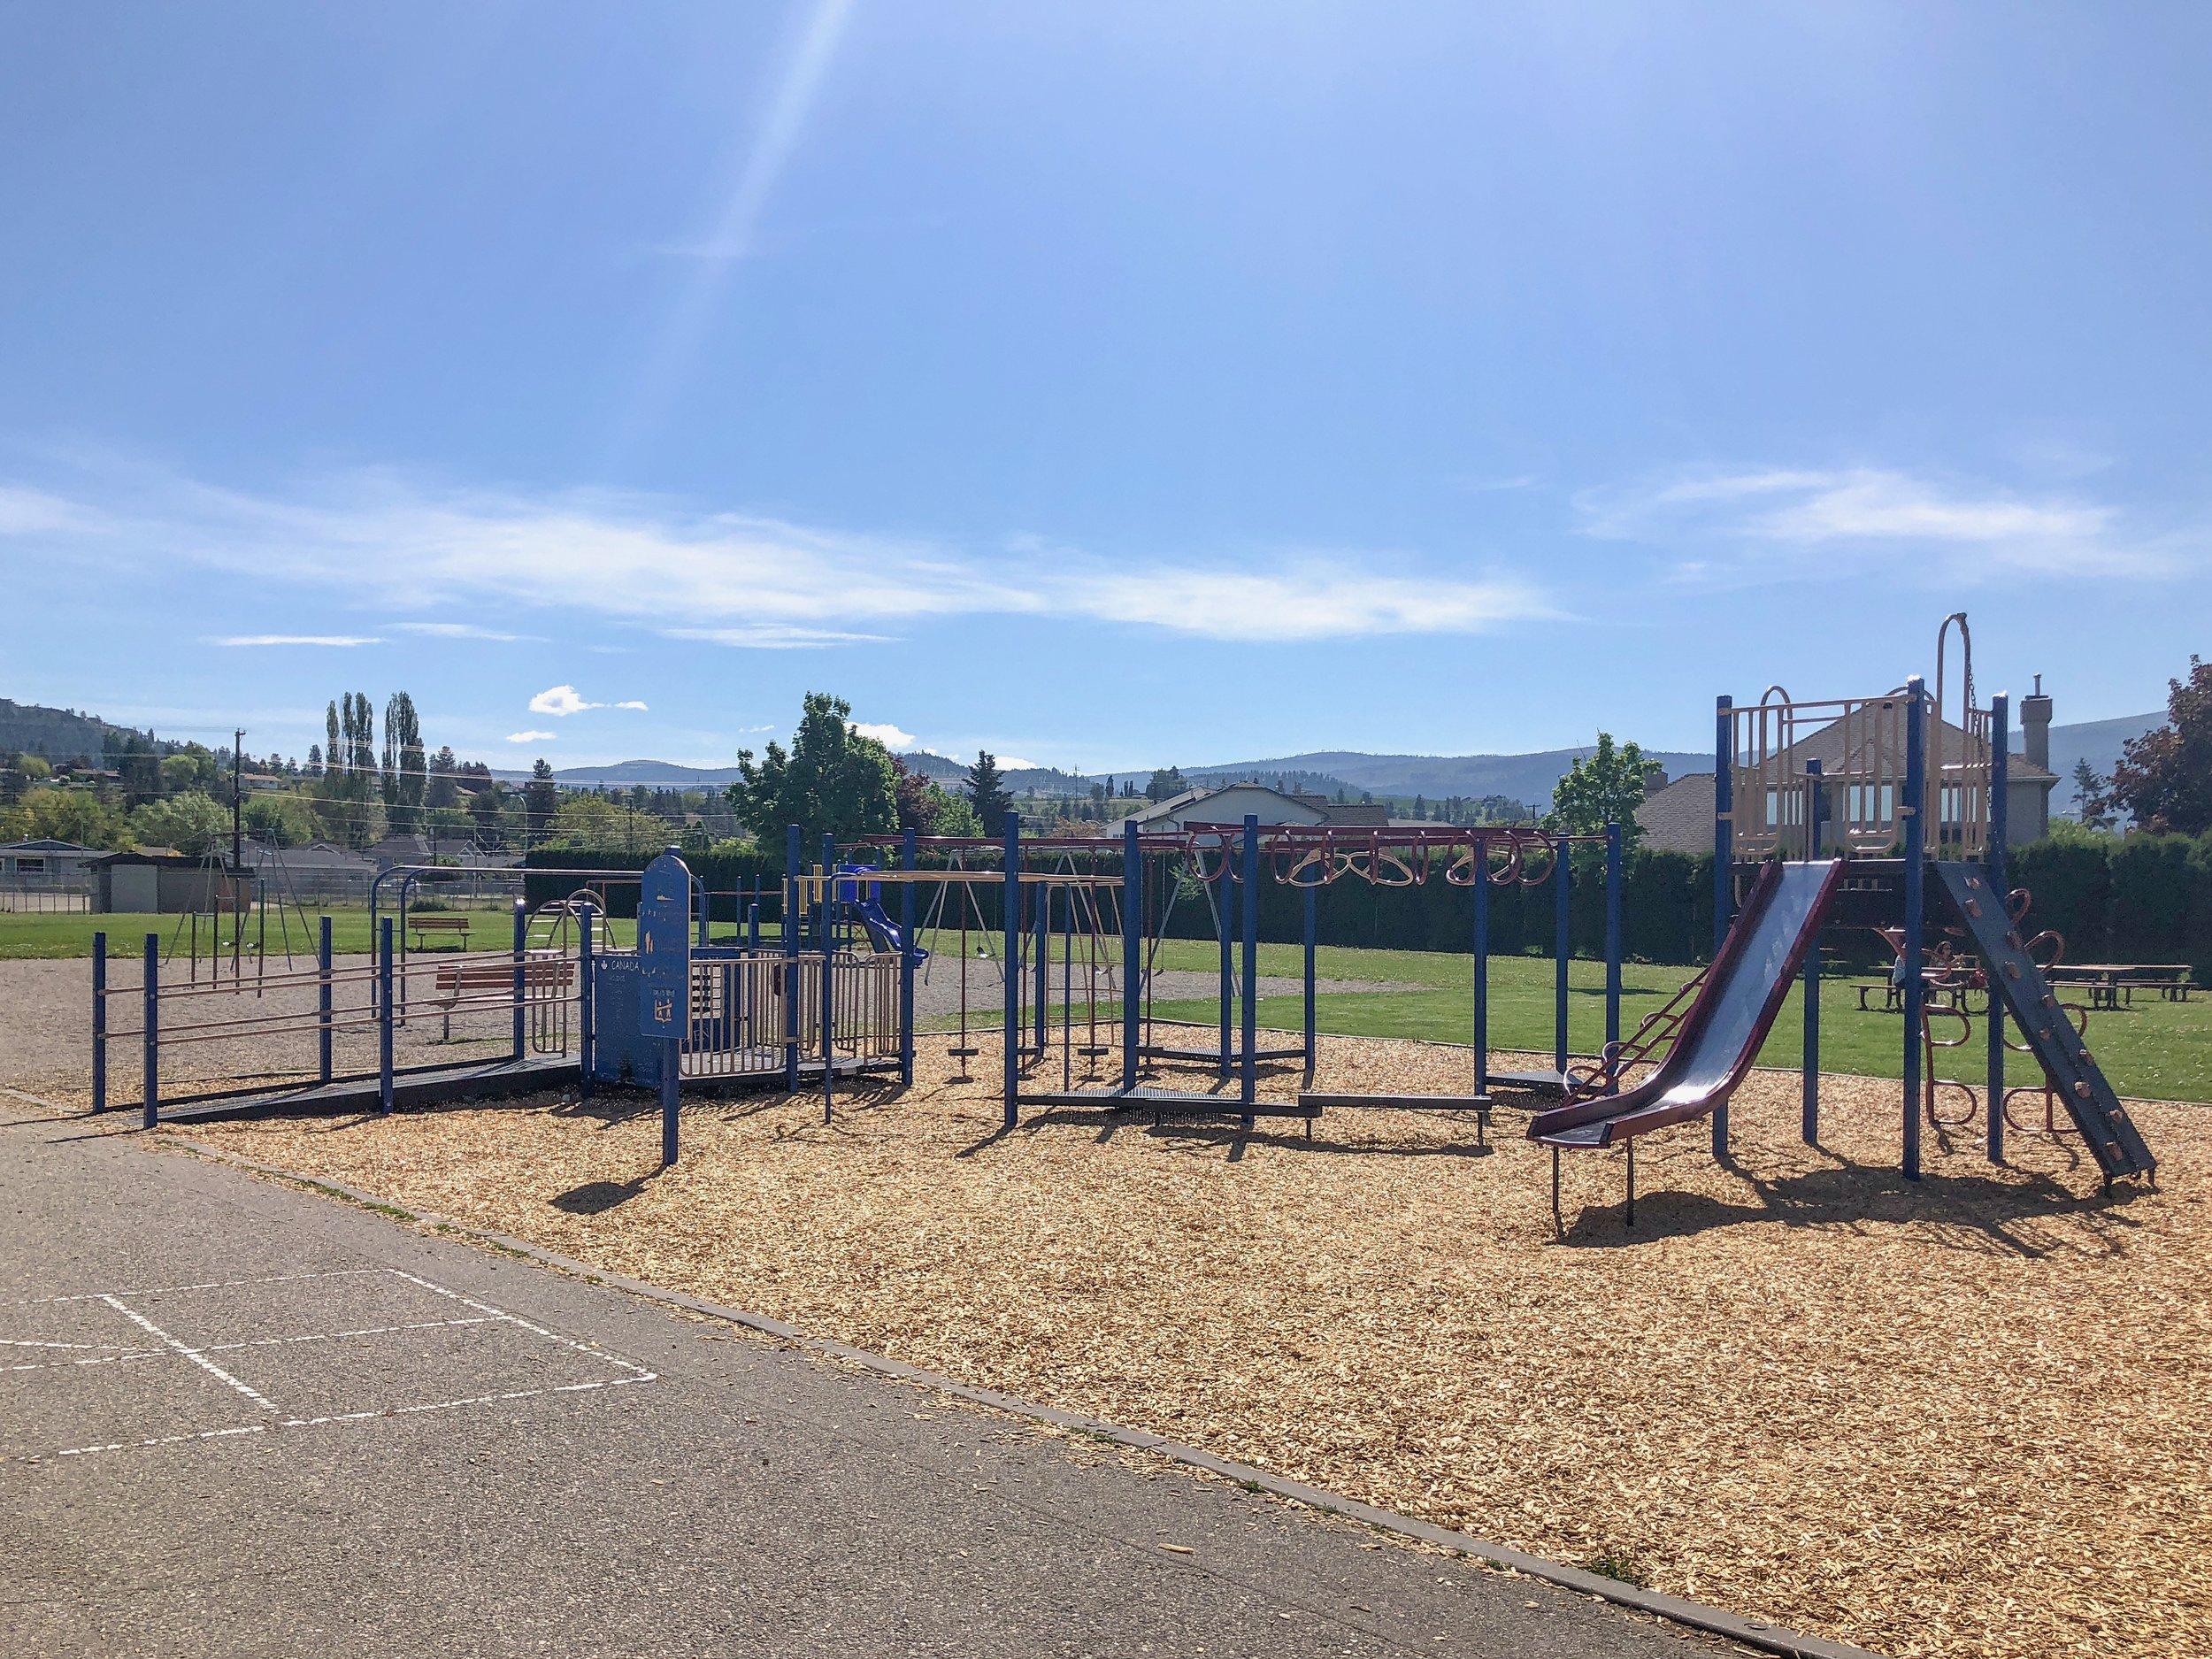 quigley-elementary-school-kelowna-rutland-neighbourhood-joshua-elliott-05.JPG